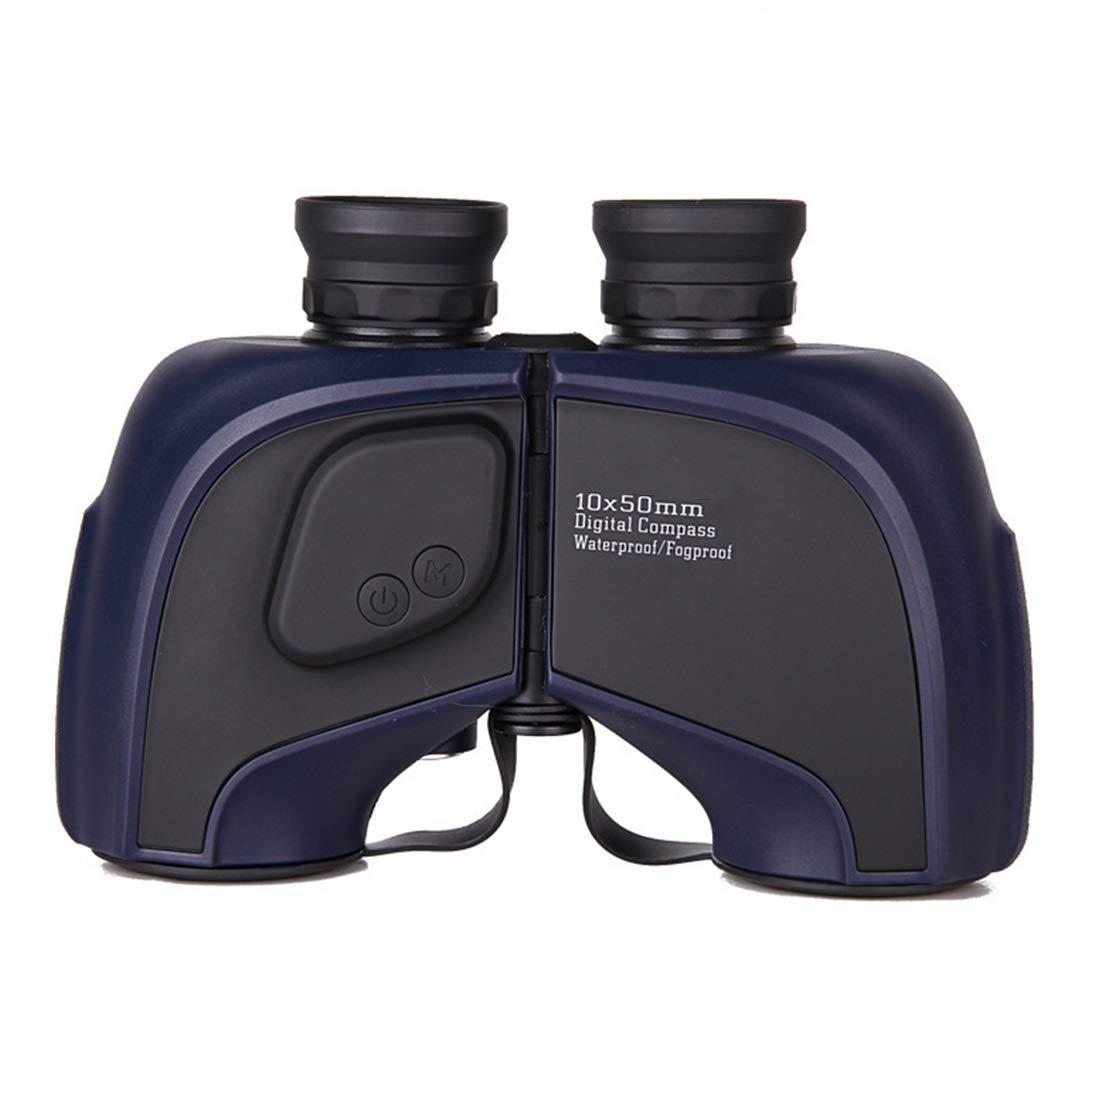 Neconyan 大人用双眼鏡10x50アウトドアプロフェッショナル - BAK4プリズムFryingレンズ付きフライスレンズ - 狩猟用バードウォッチング用のHDビュー双眼鏡 B07KCHMKT8  ブラック